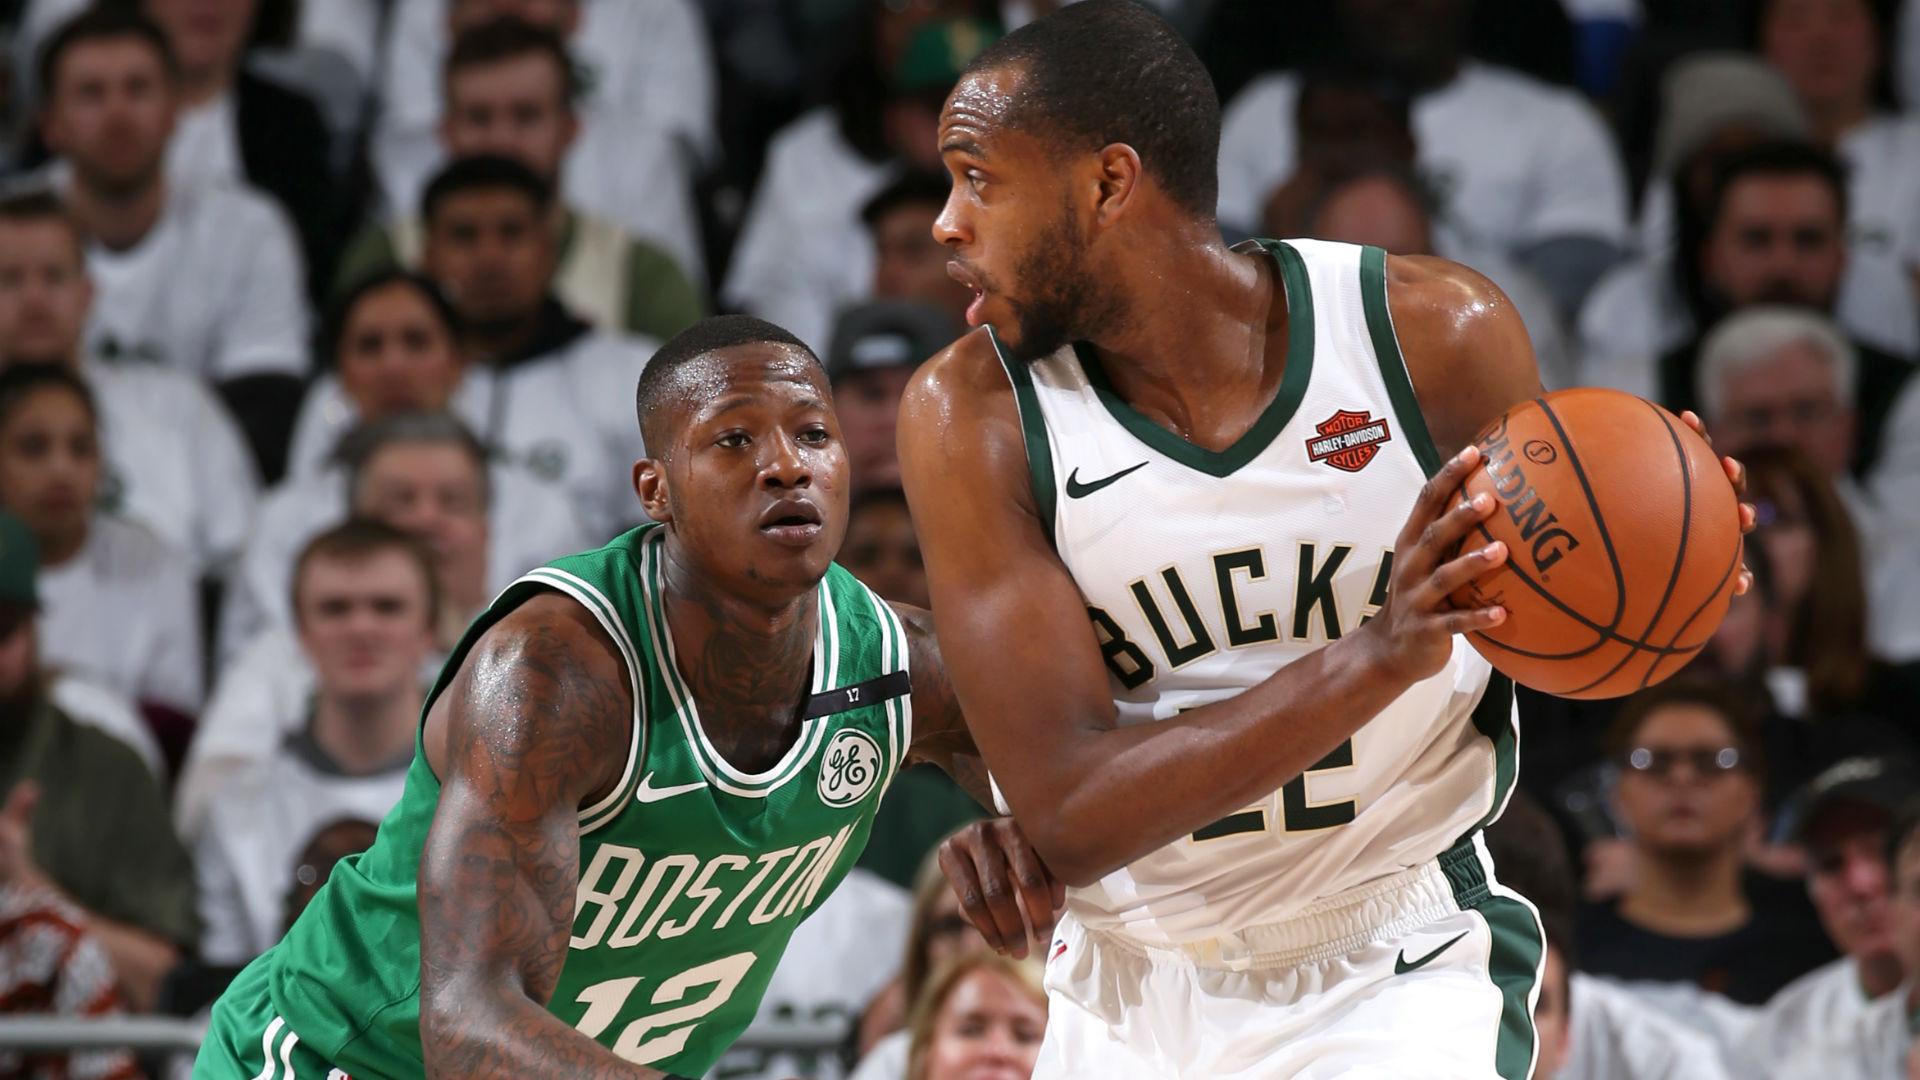 Nba Playoffs 2019 Milwaukee Bucks Vs Boston Celtics Live